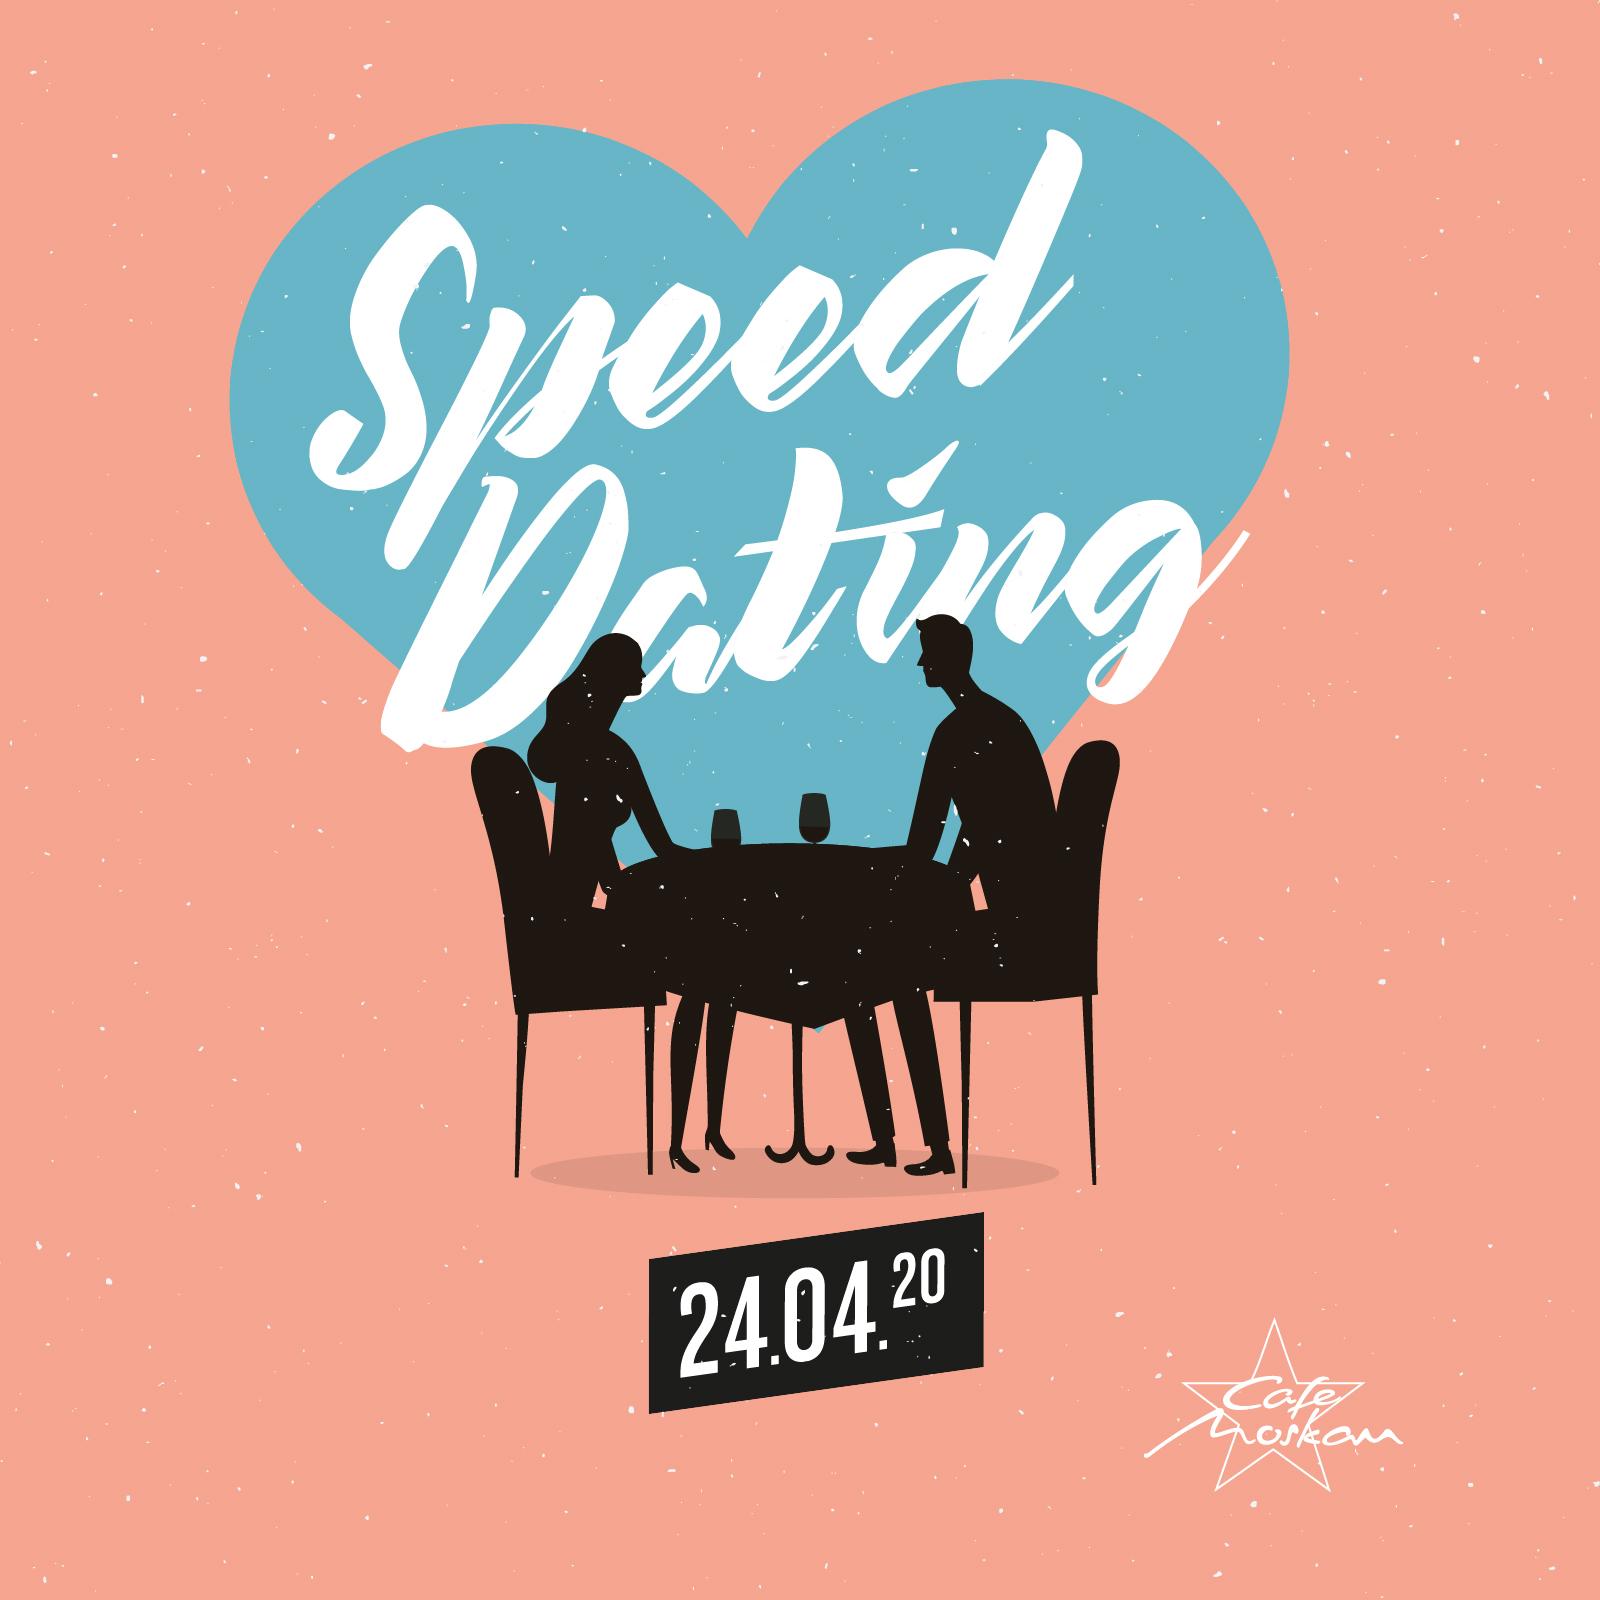 chemnitz speed dating